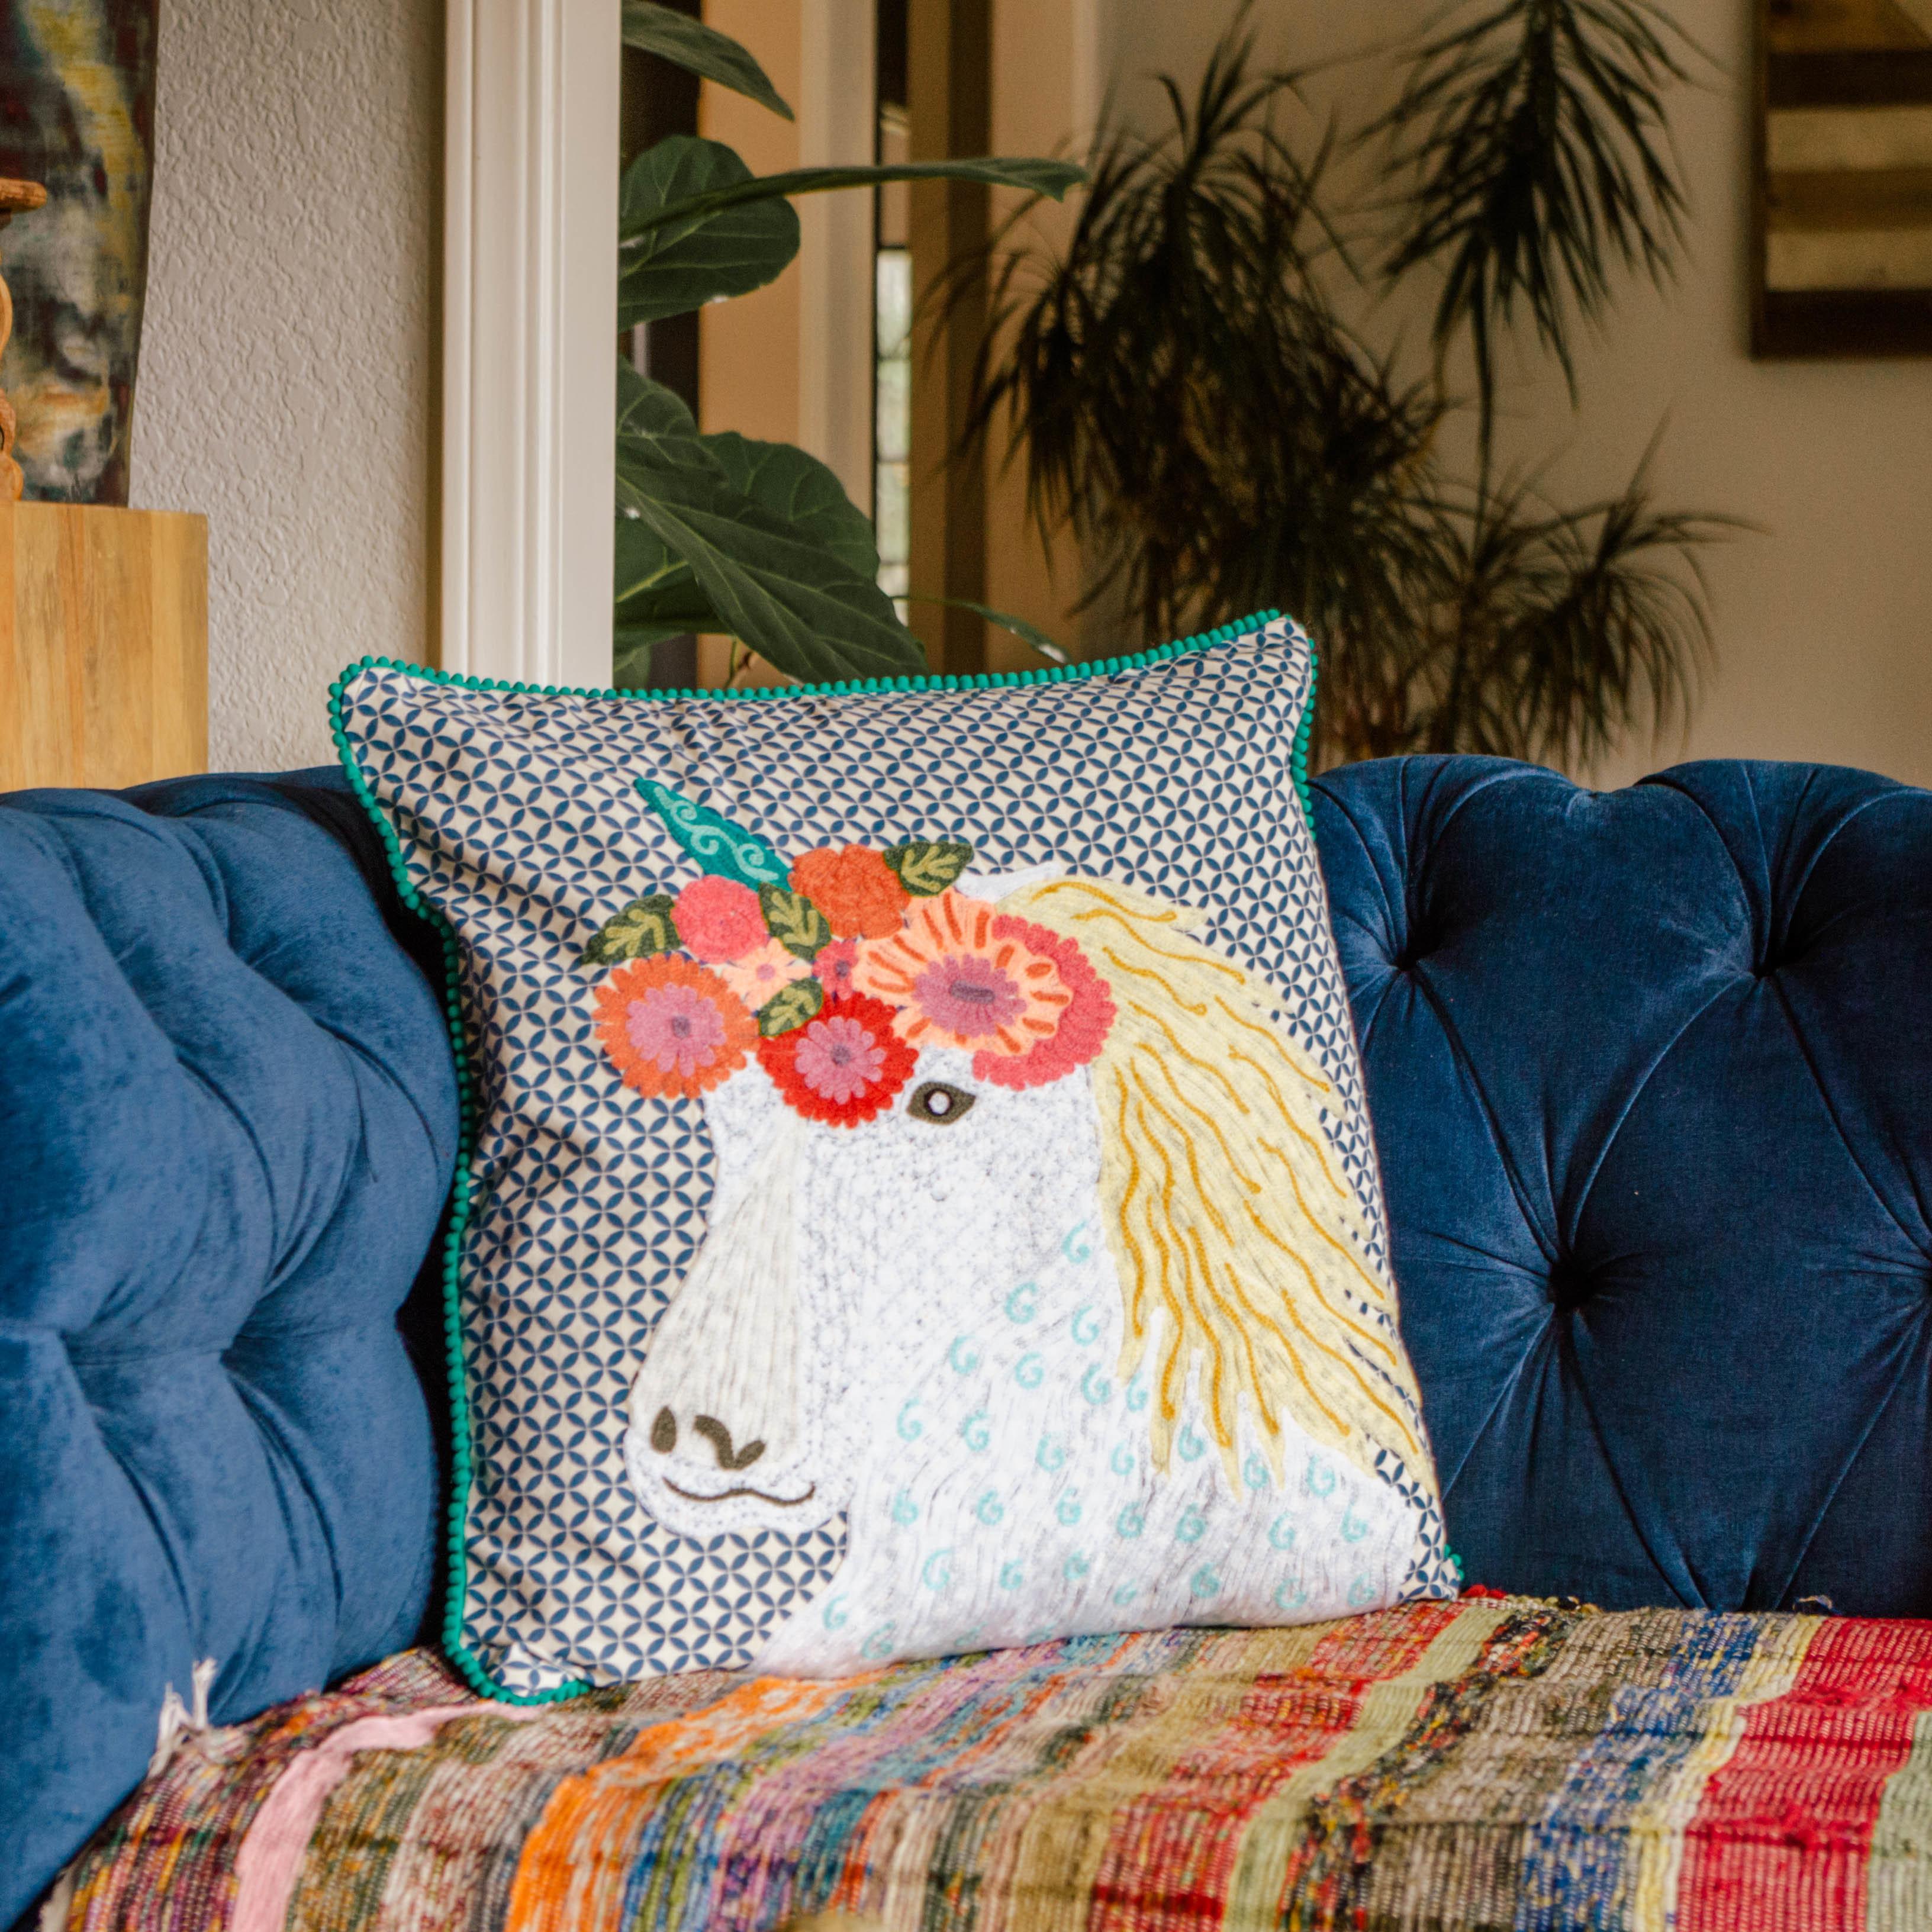 Unicorn pillow abcc161043_Blyl